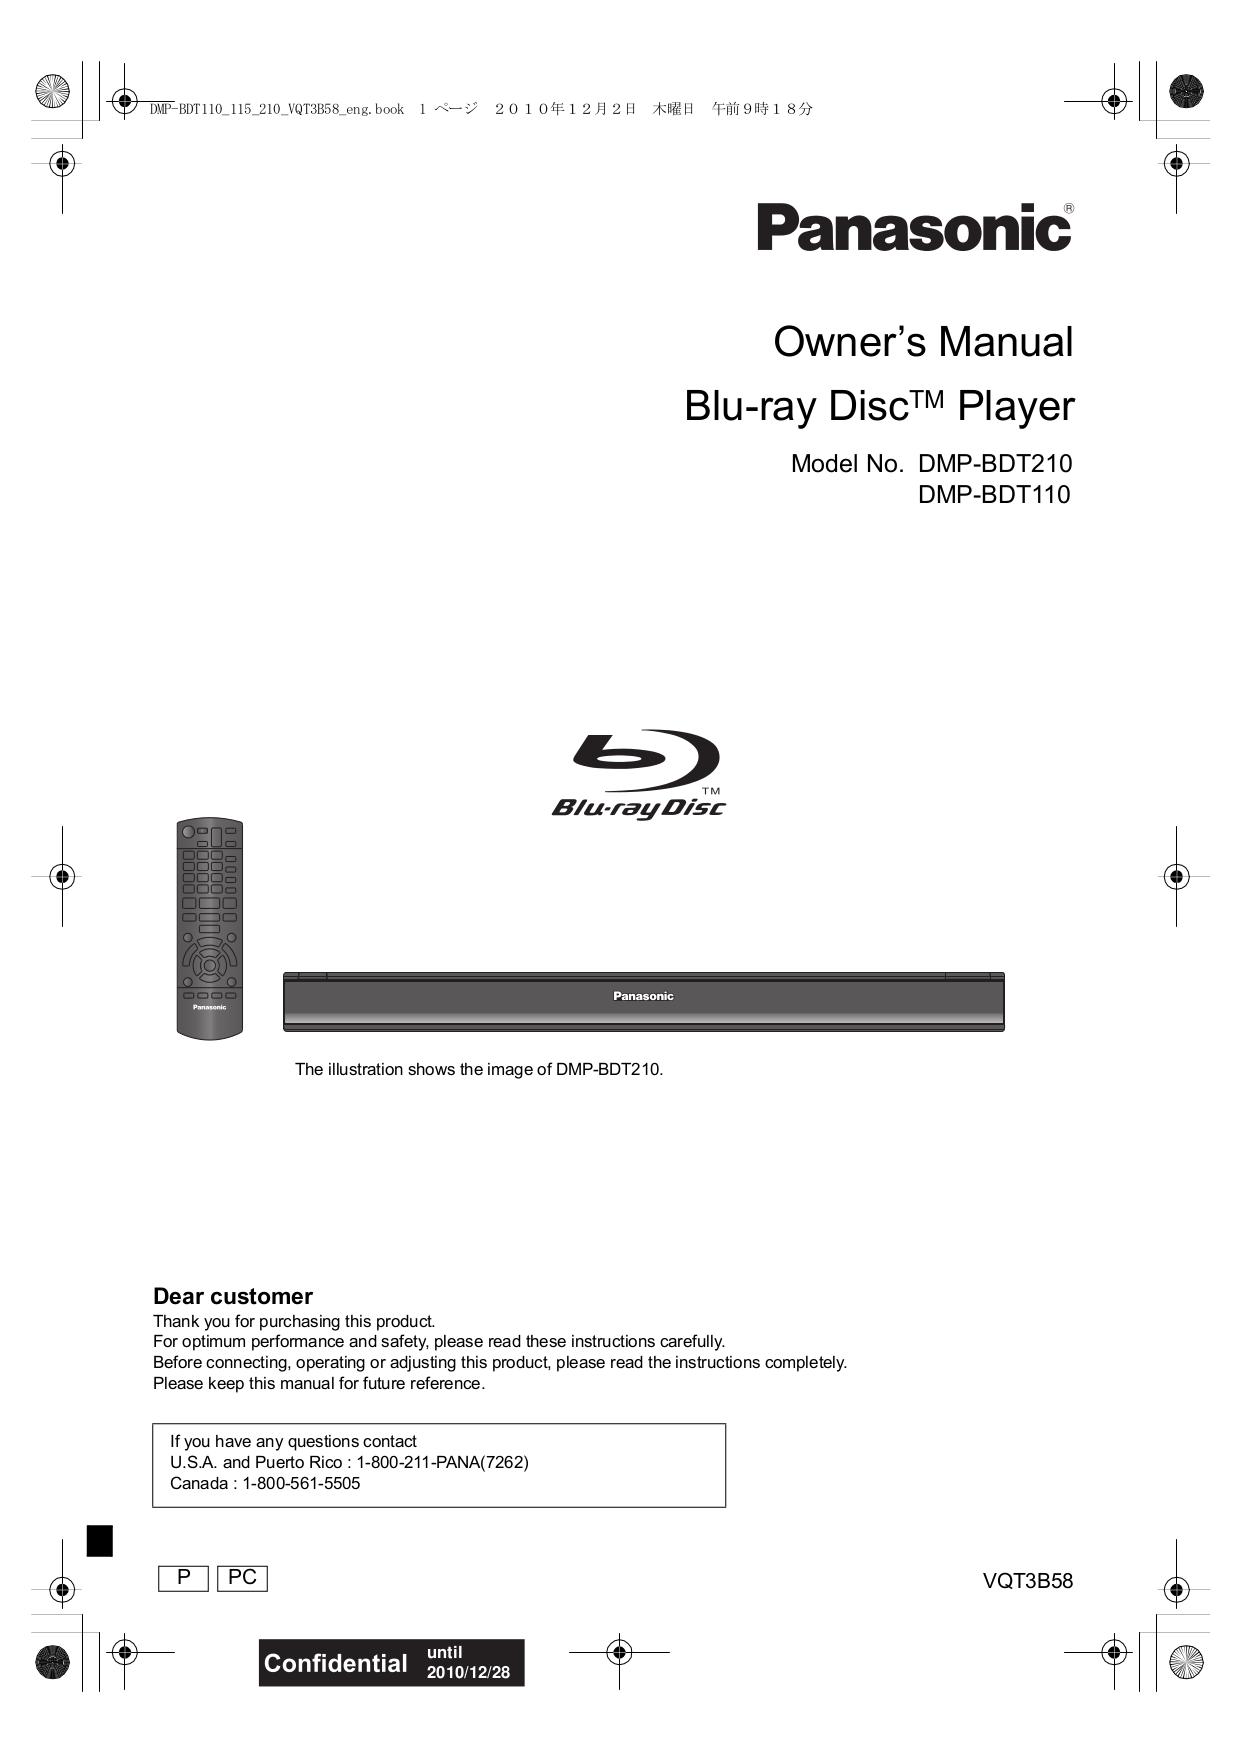 download free pdf for panasonic dmp bdt110 dvd players manual rh umlib com panasonic blu ray dmp-bdt110 manual panasonic blu ray dmp-bdt110 manual